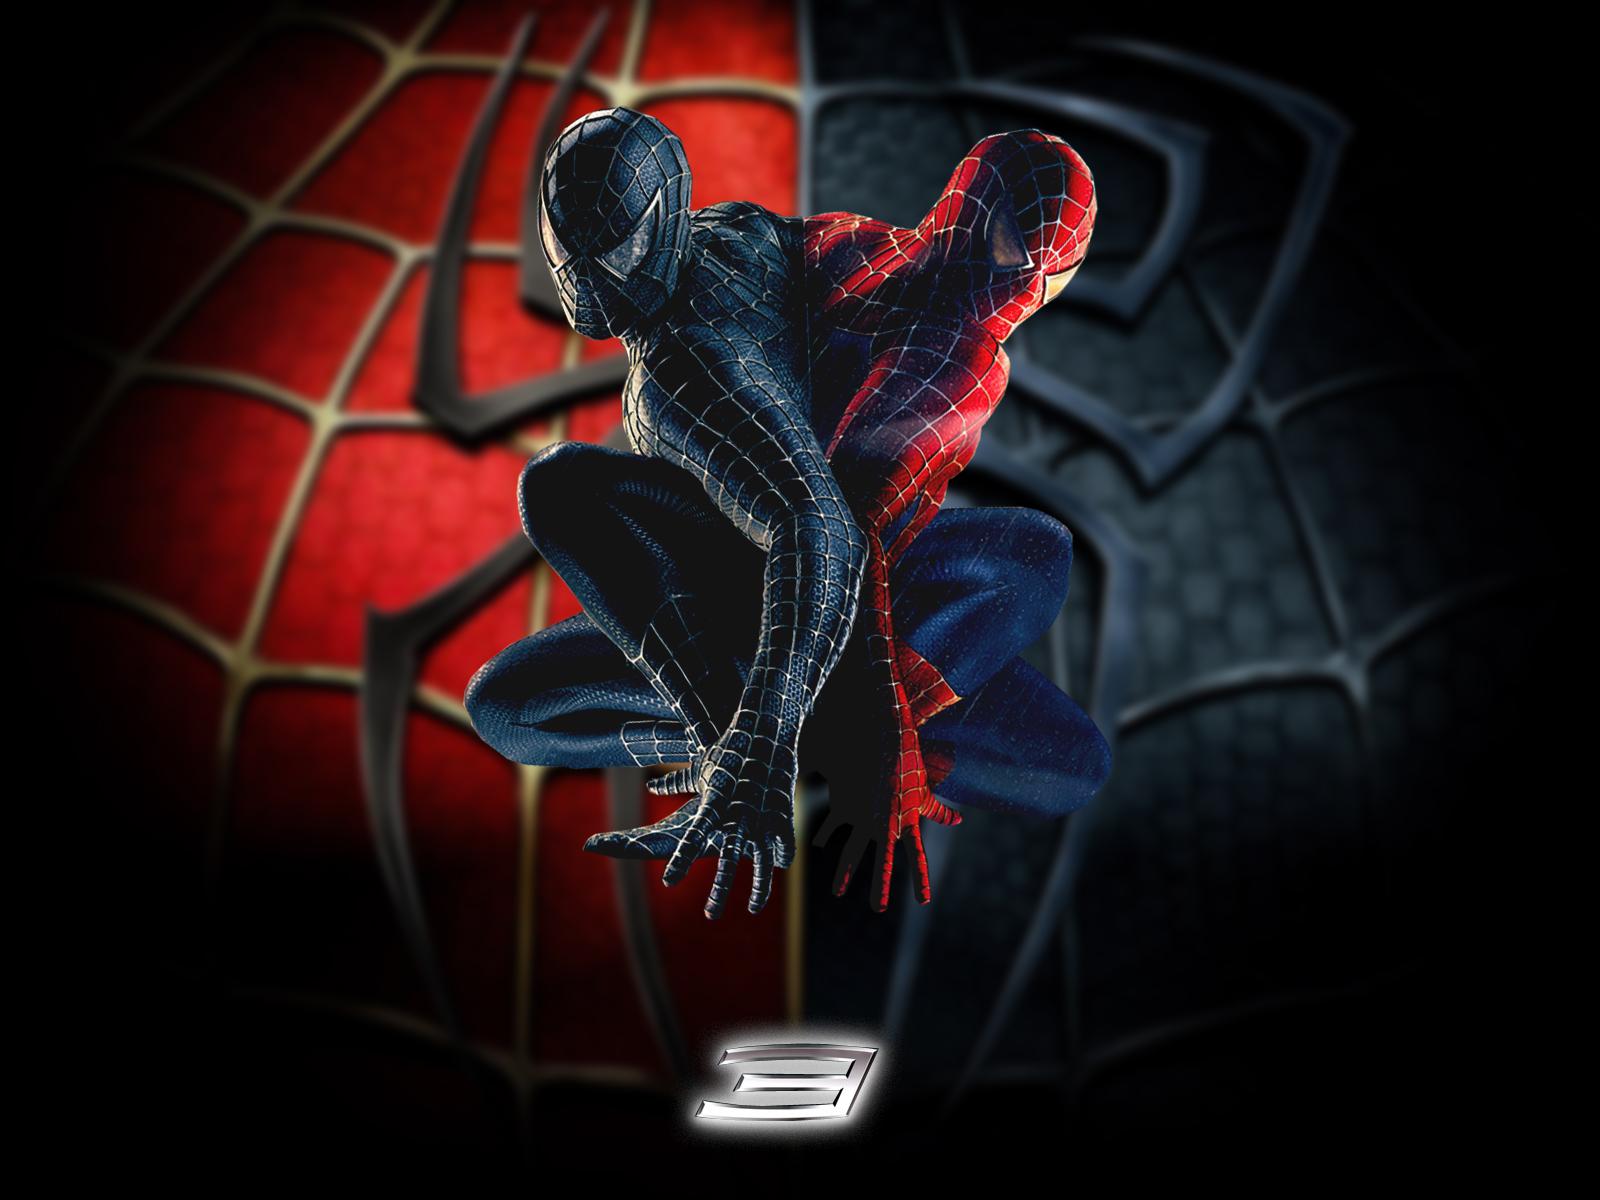 49 Spider Man 3 Wallpaper On Wallpapersafari